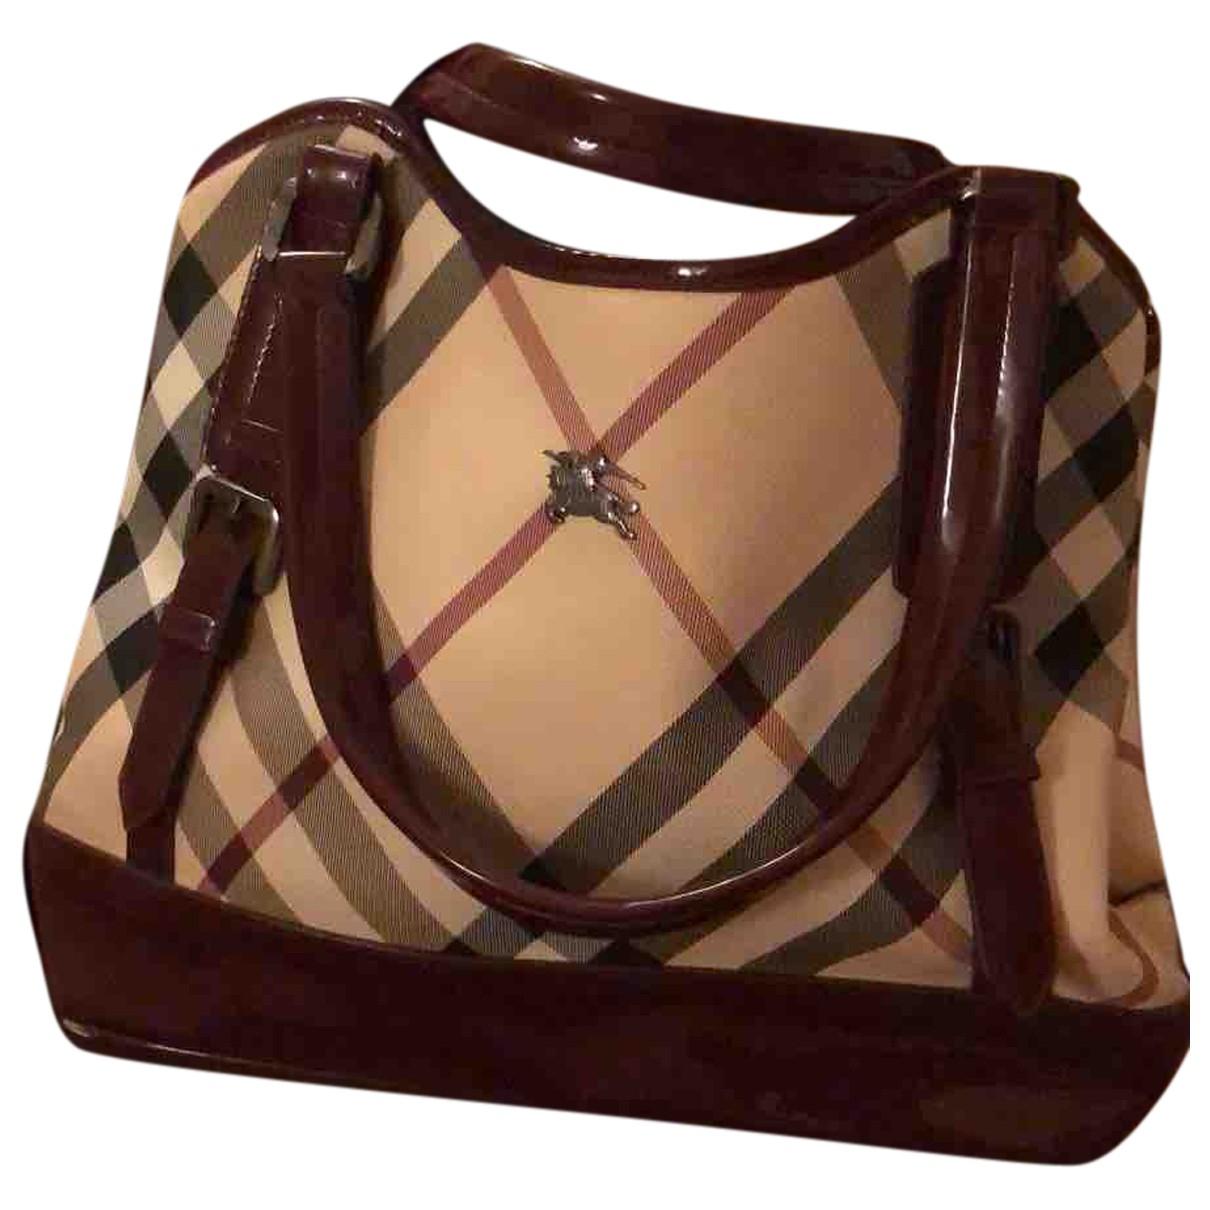 Burberry \N Handtasche in Baumwolle